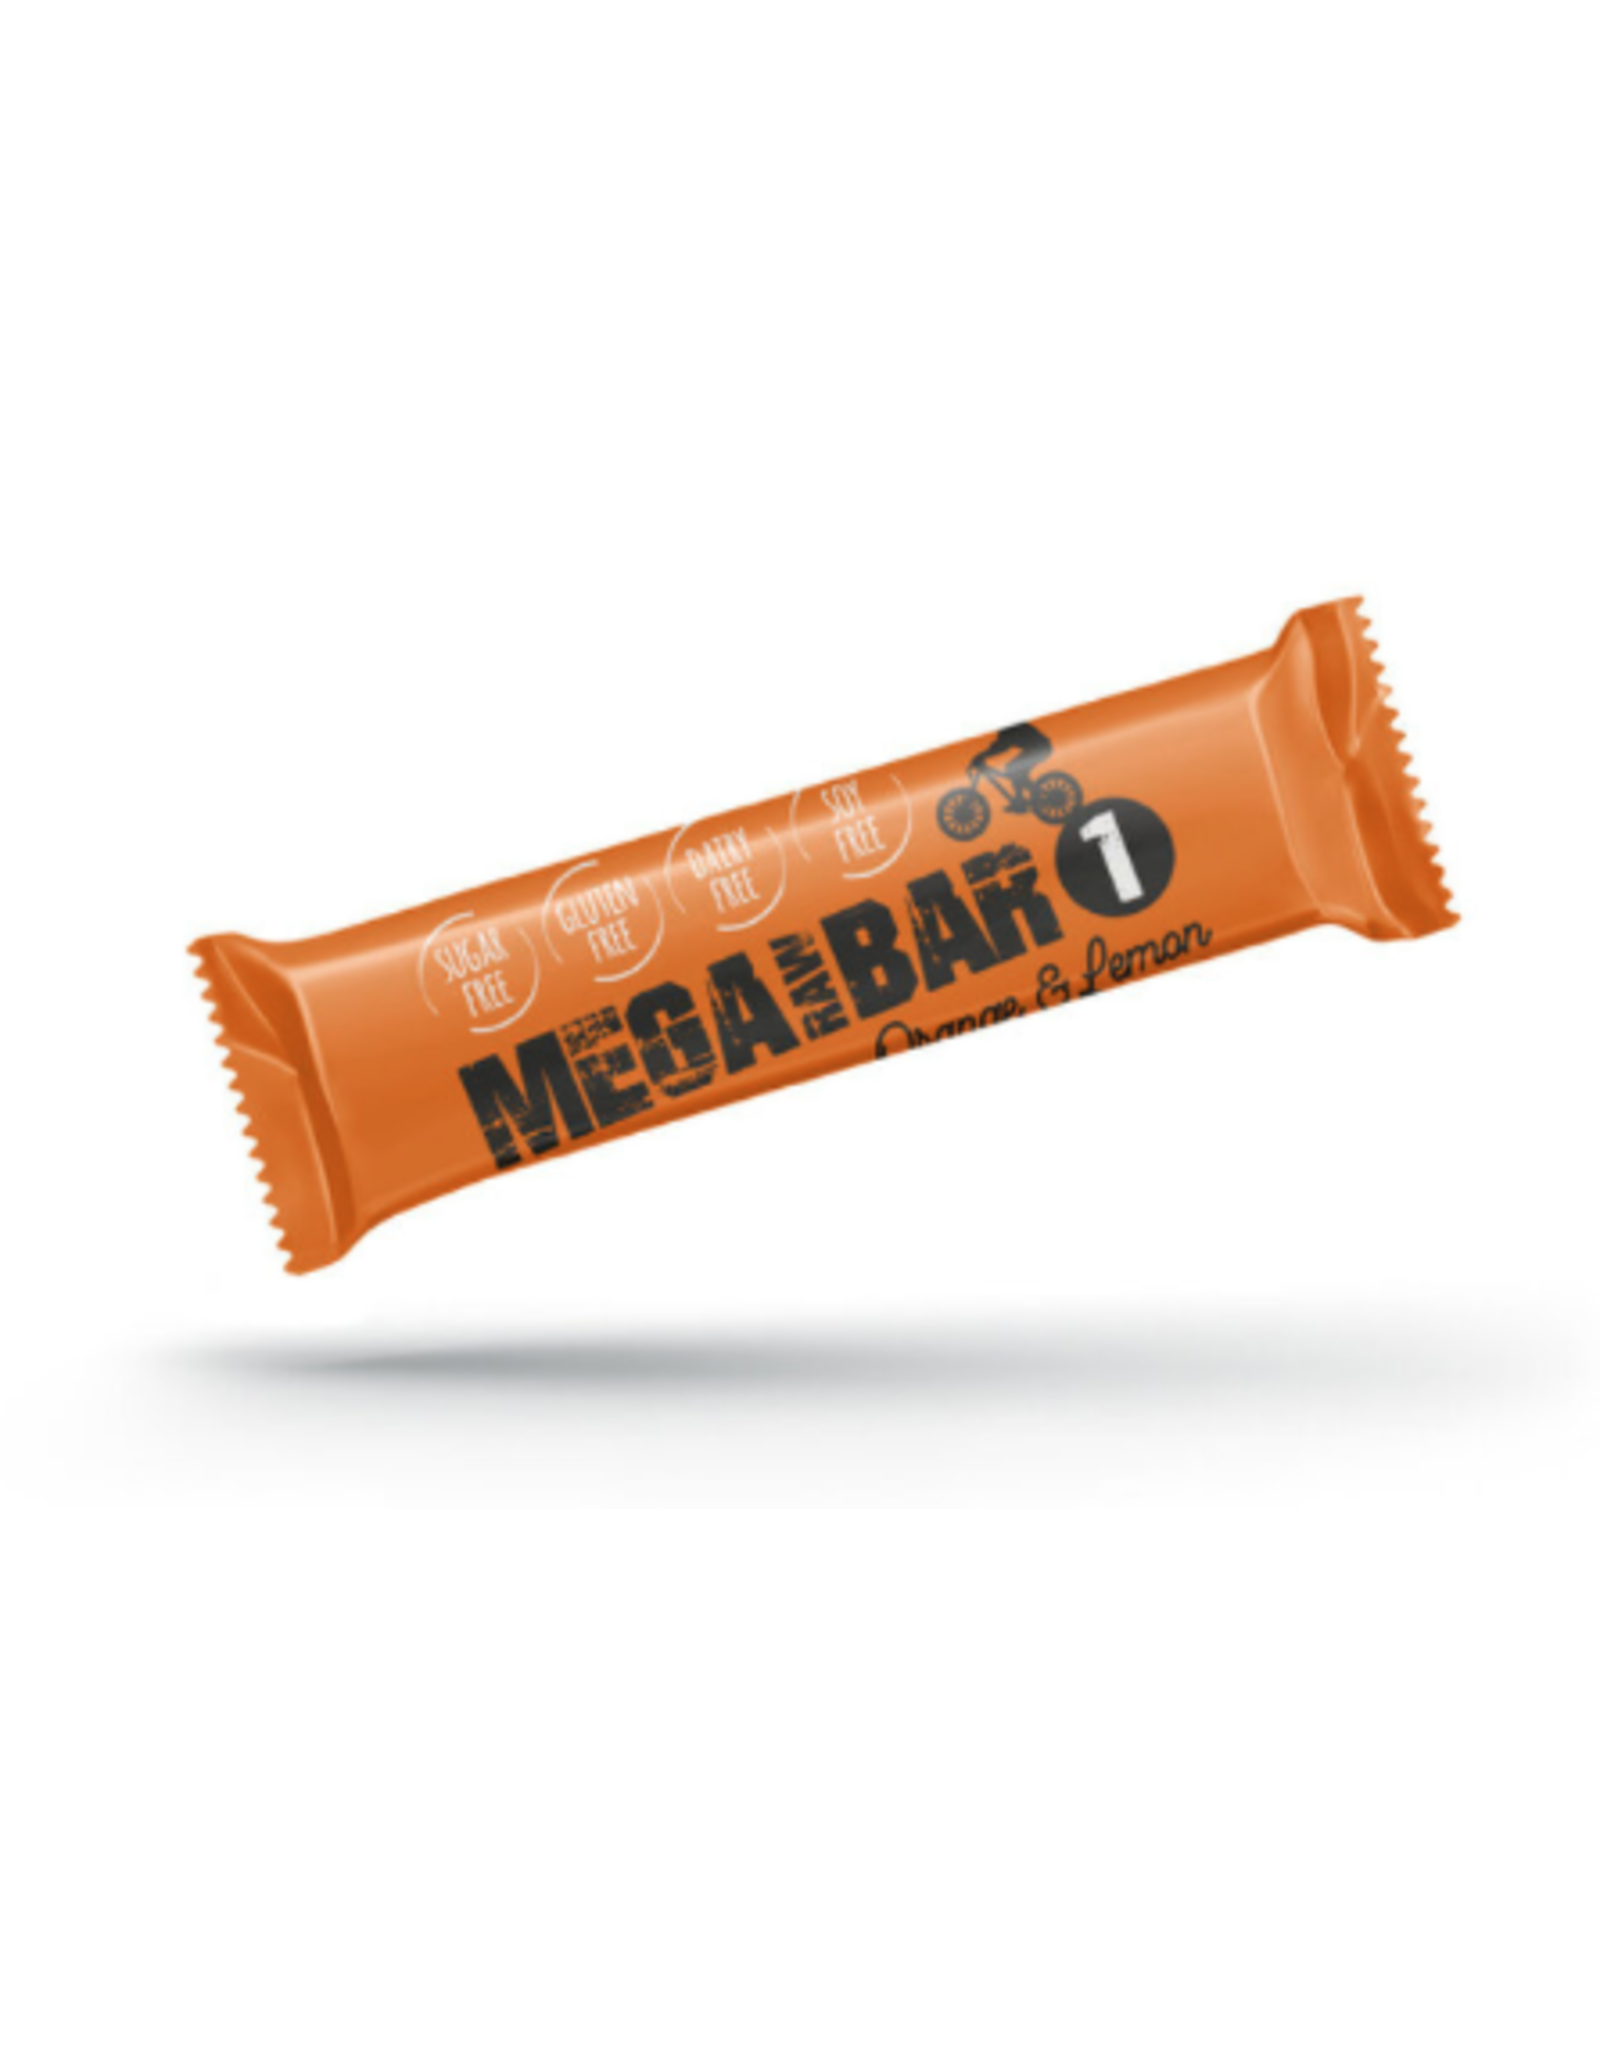 MEGARAWBAR 1, 40g